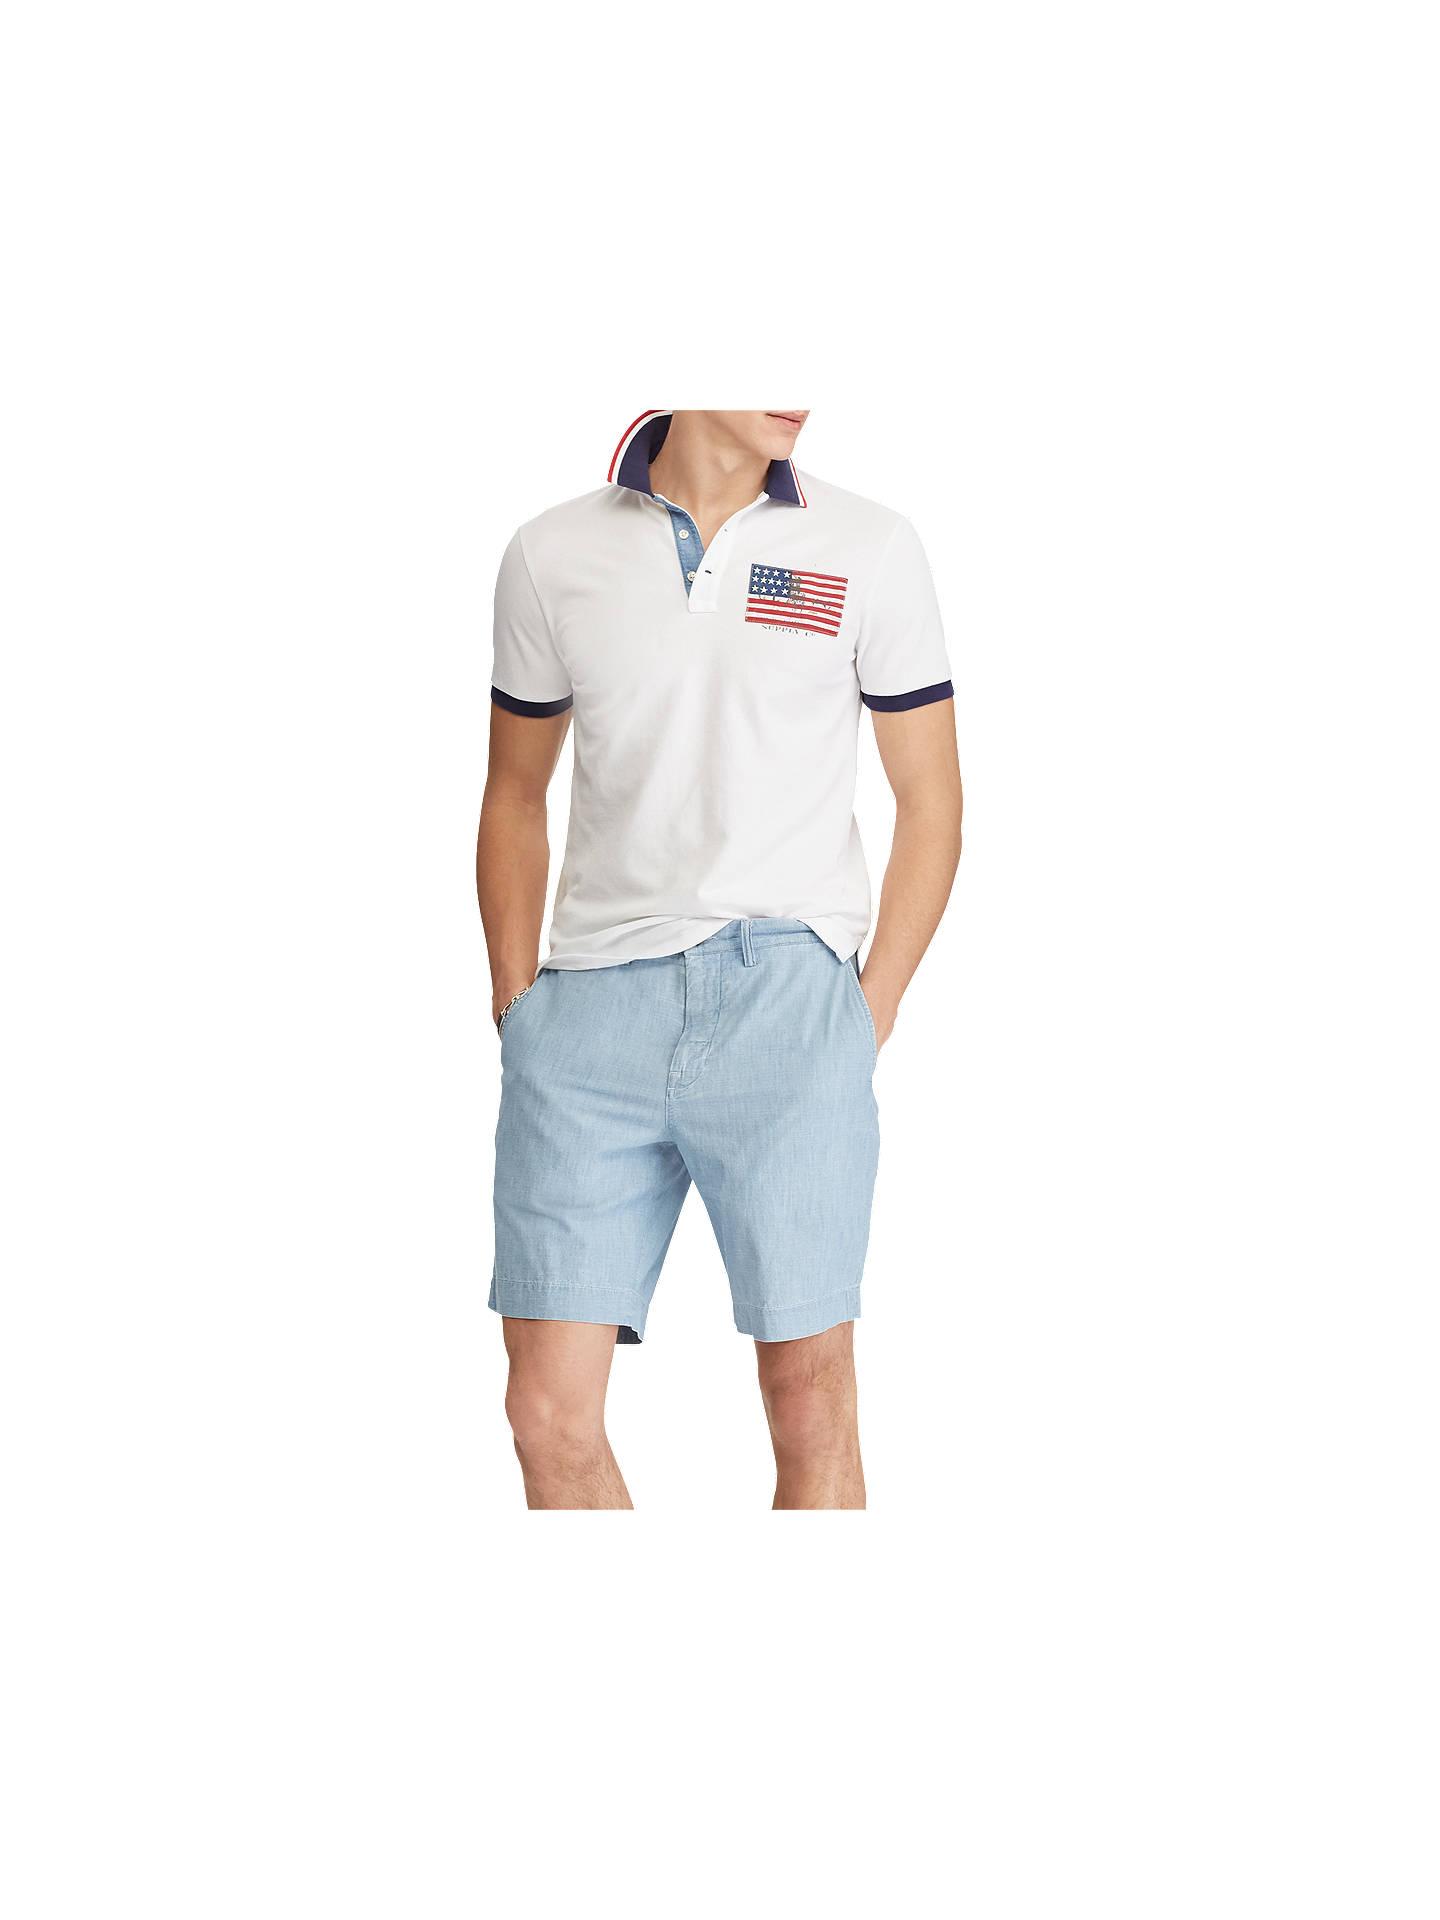 Polo Flag Lauren Fit ShirtWhite American At Ralph Custom John CsthQBrdxo